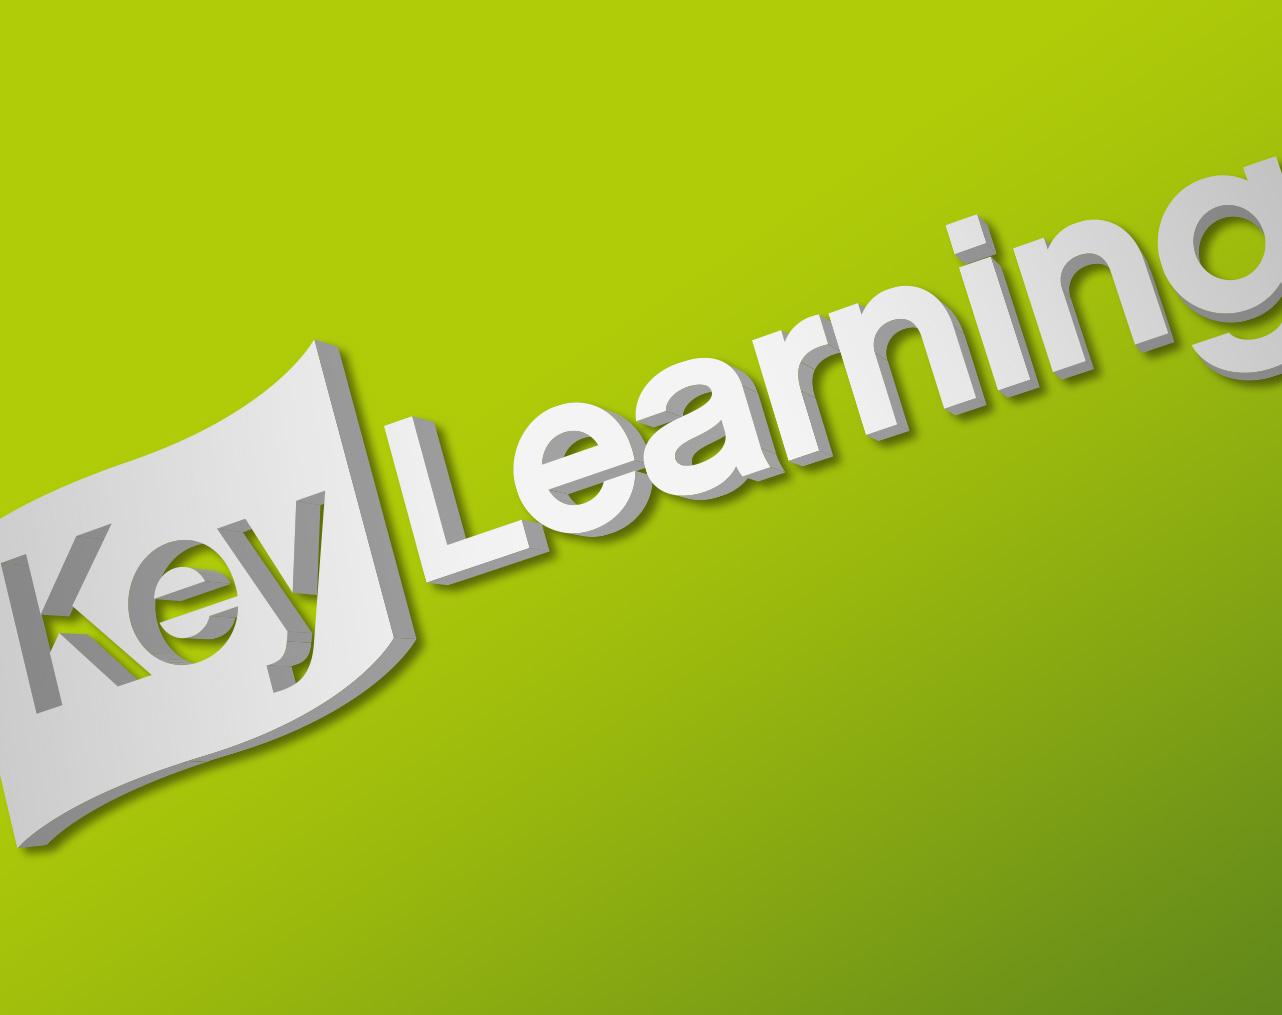 key_learning_premises_04.jpg